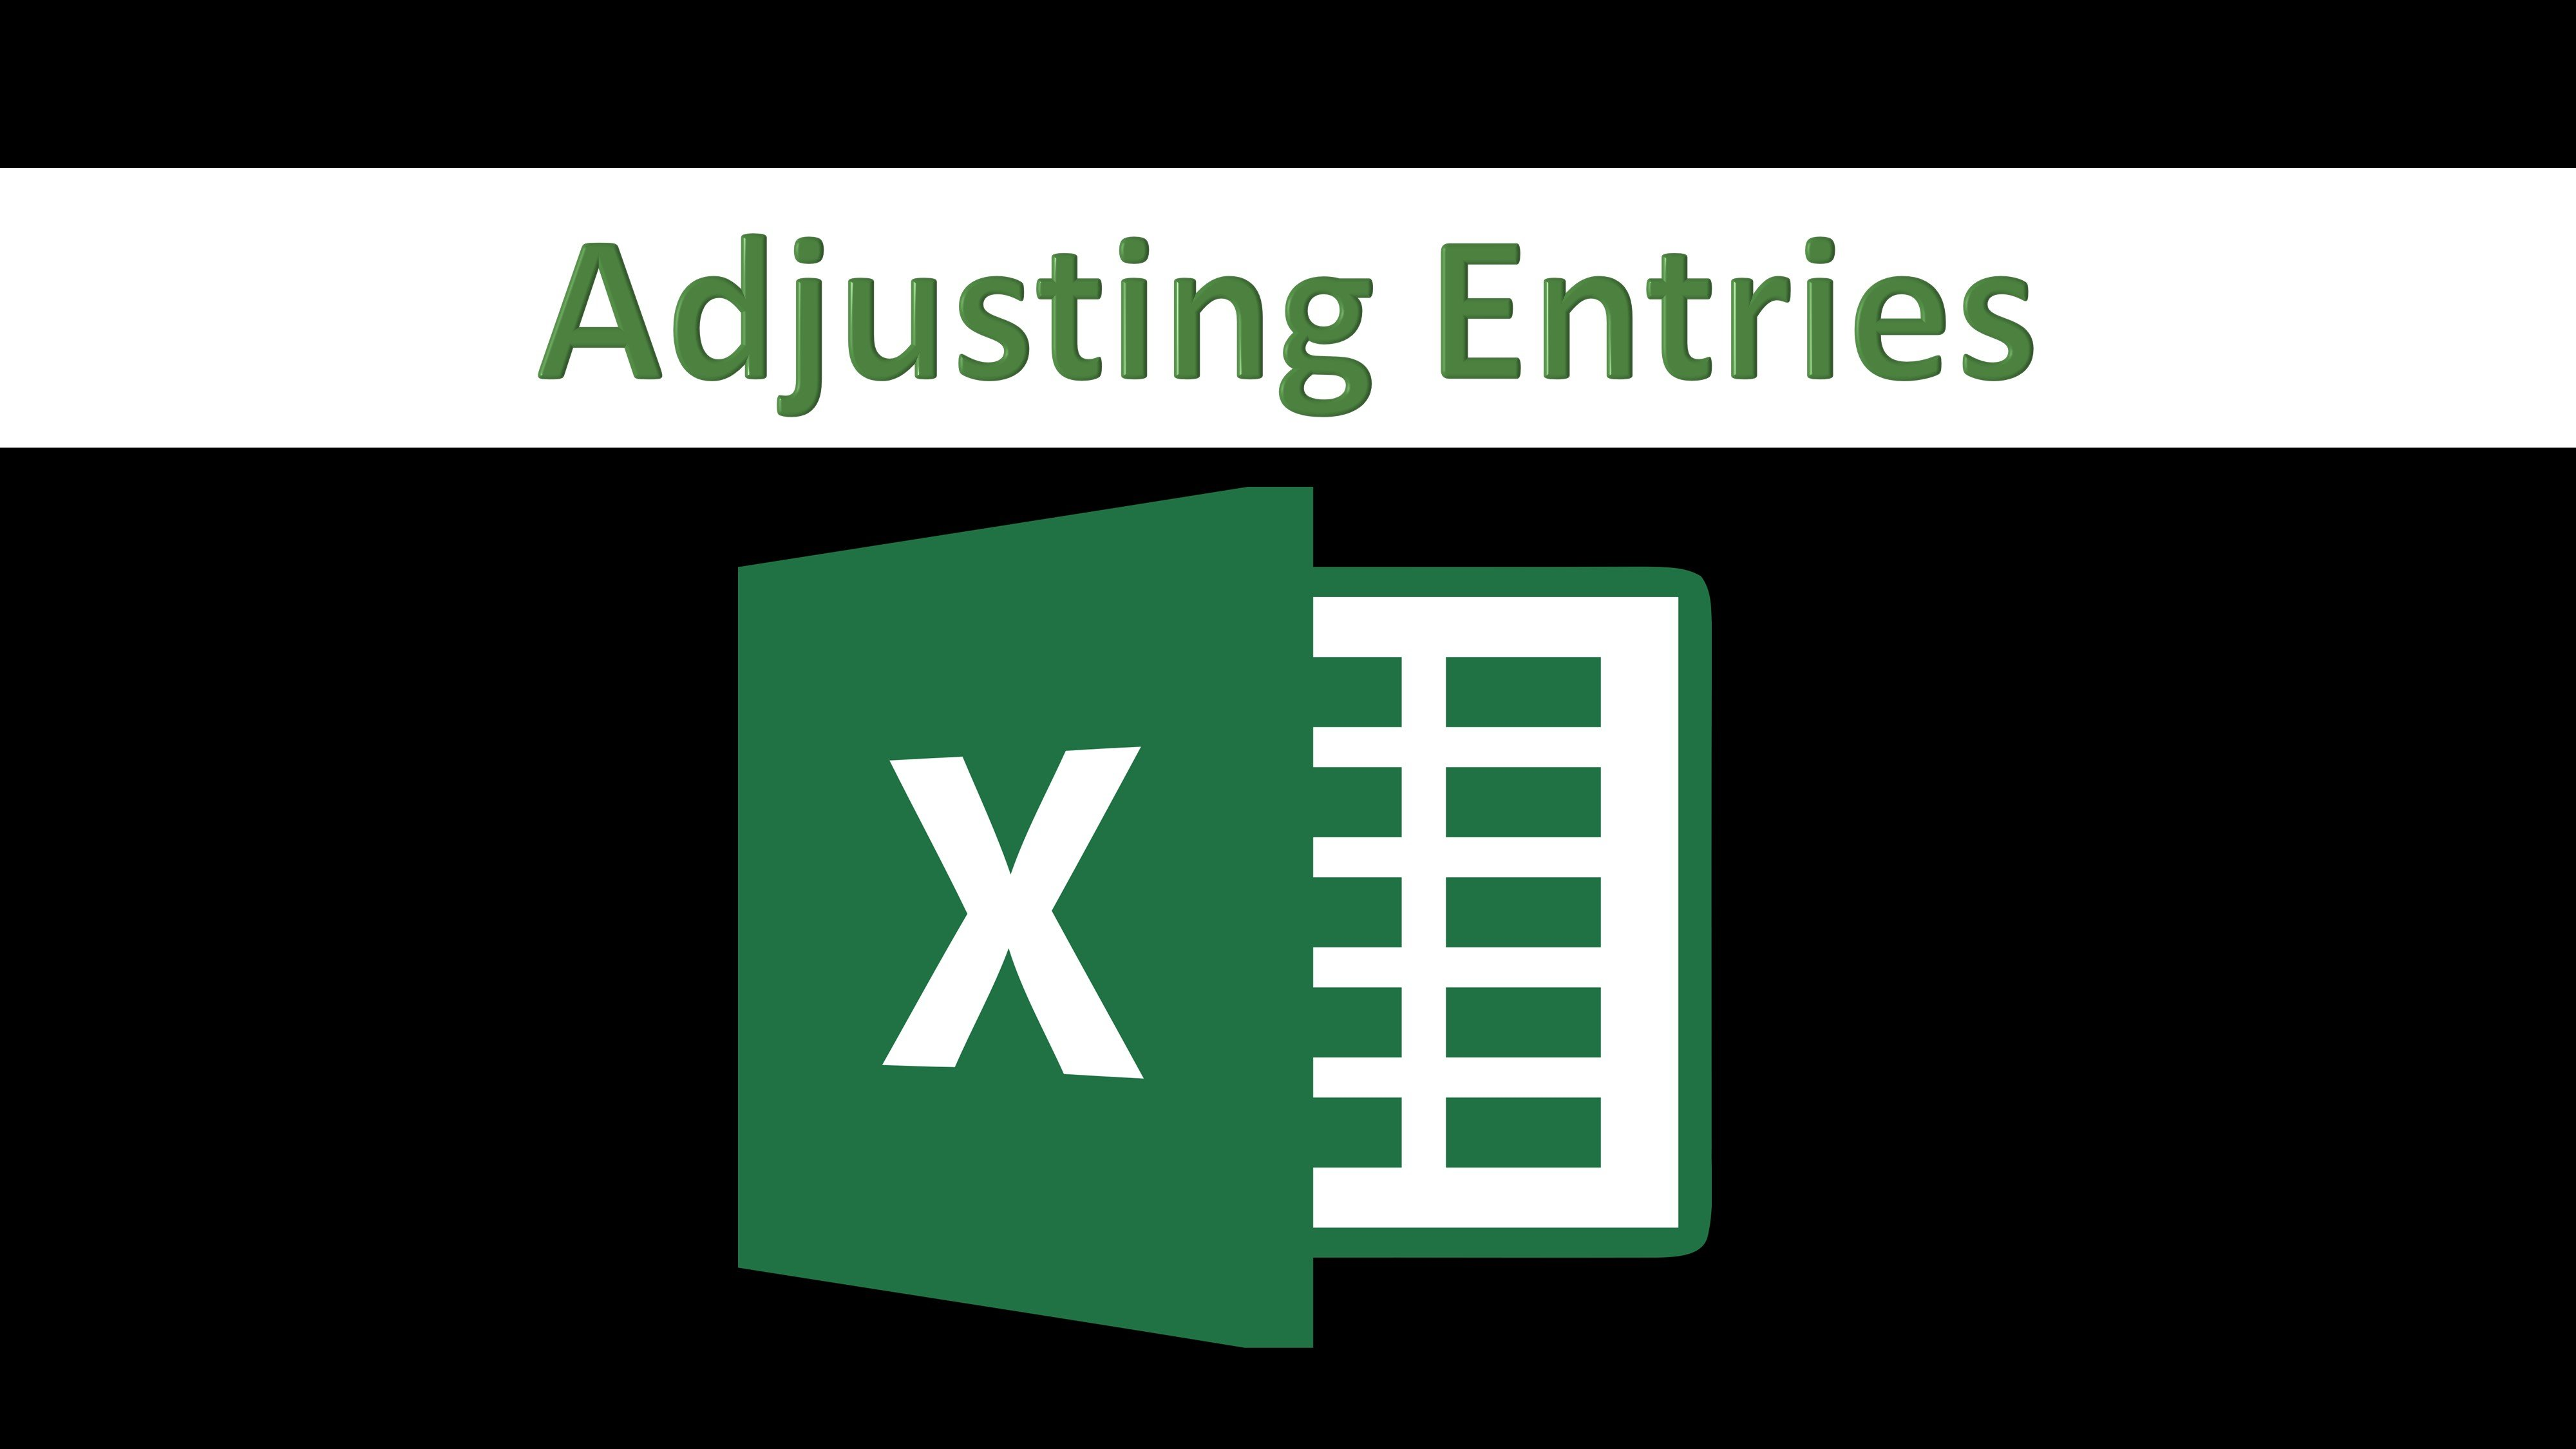 Adjusting Entries - Financial Accounting